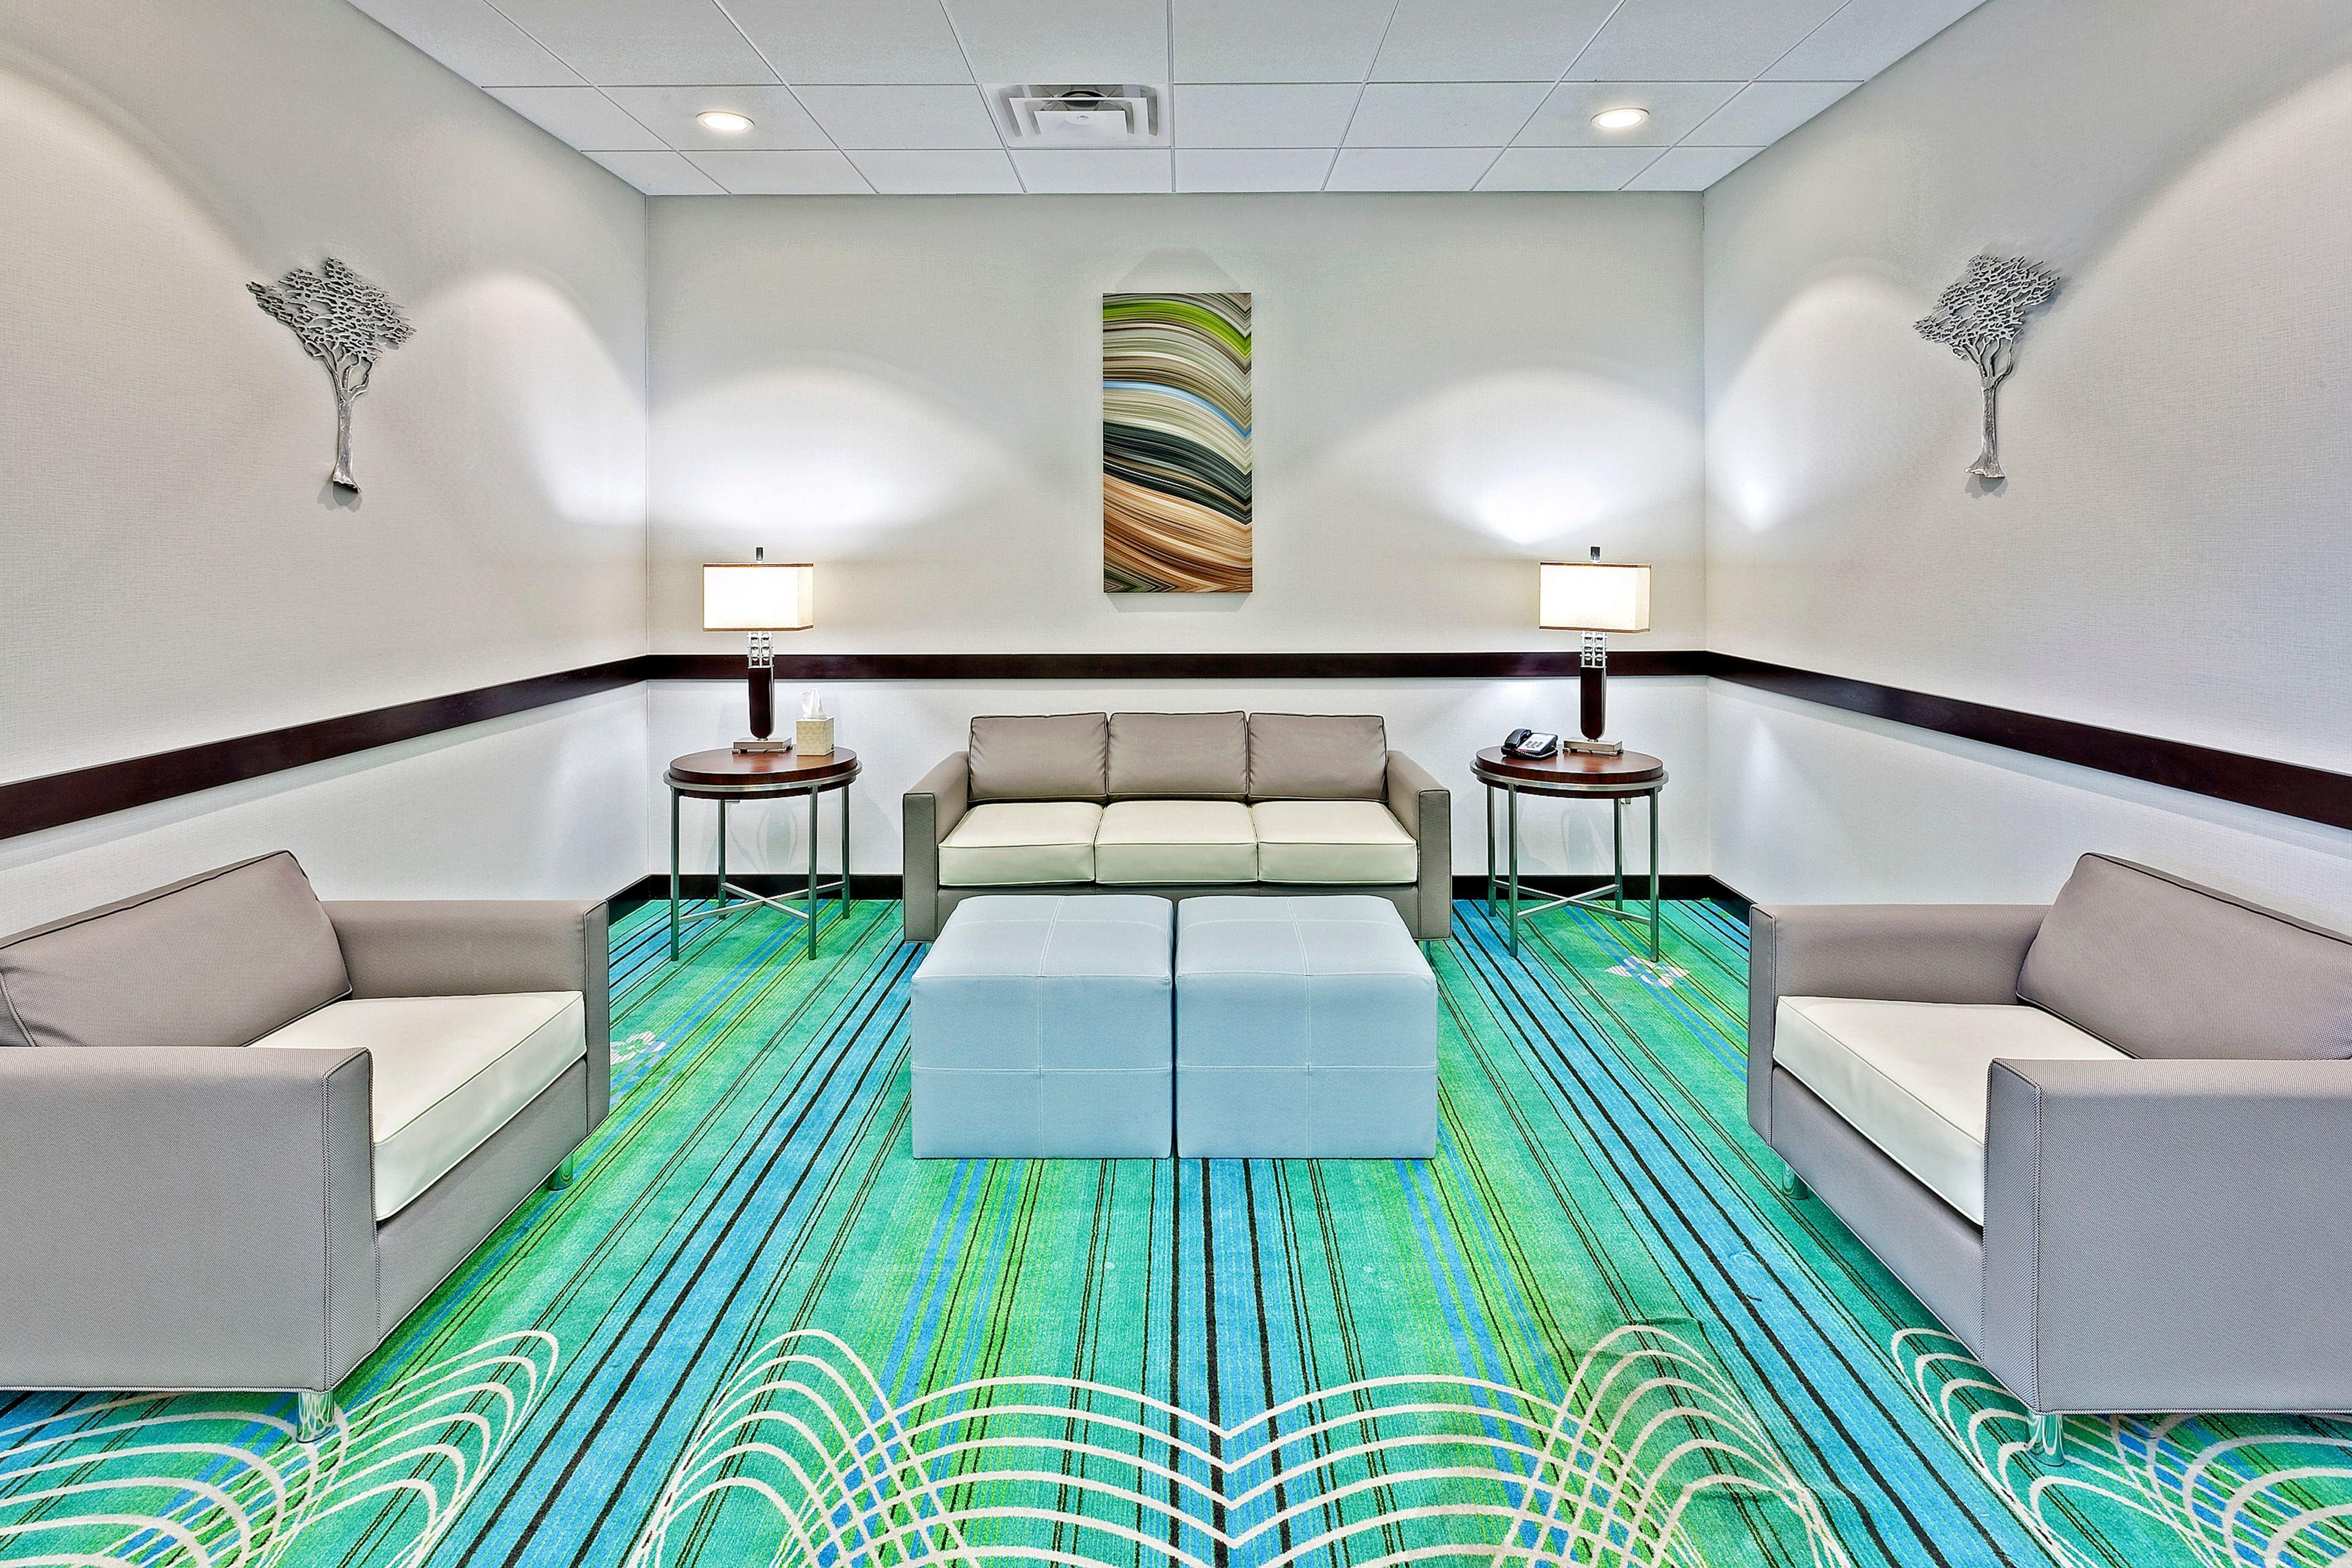 Holiday Inn Express & Suites New Philadelphia image 4